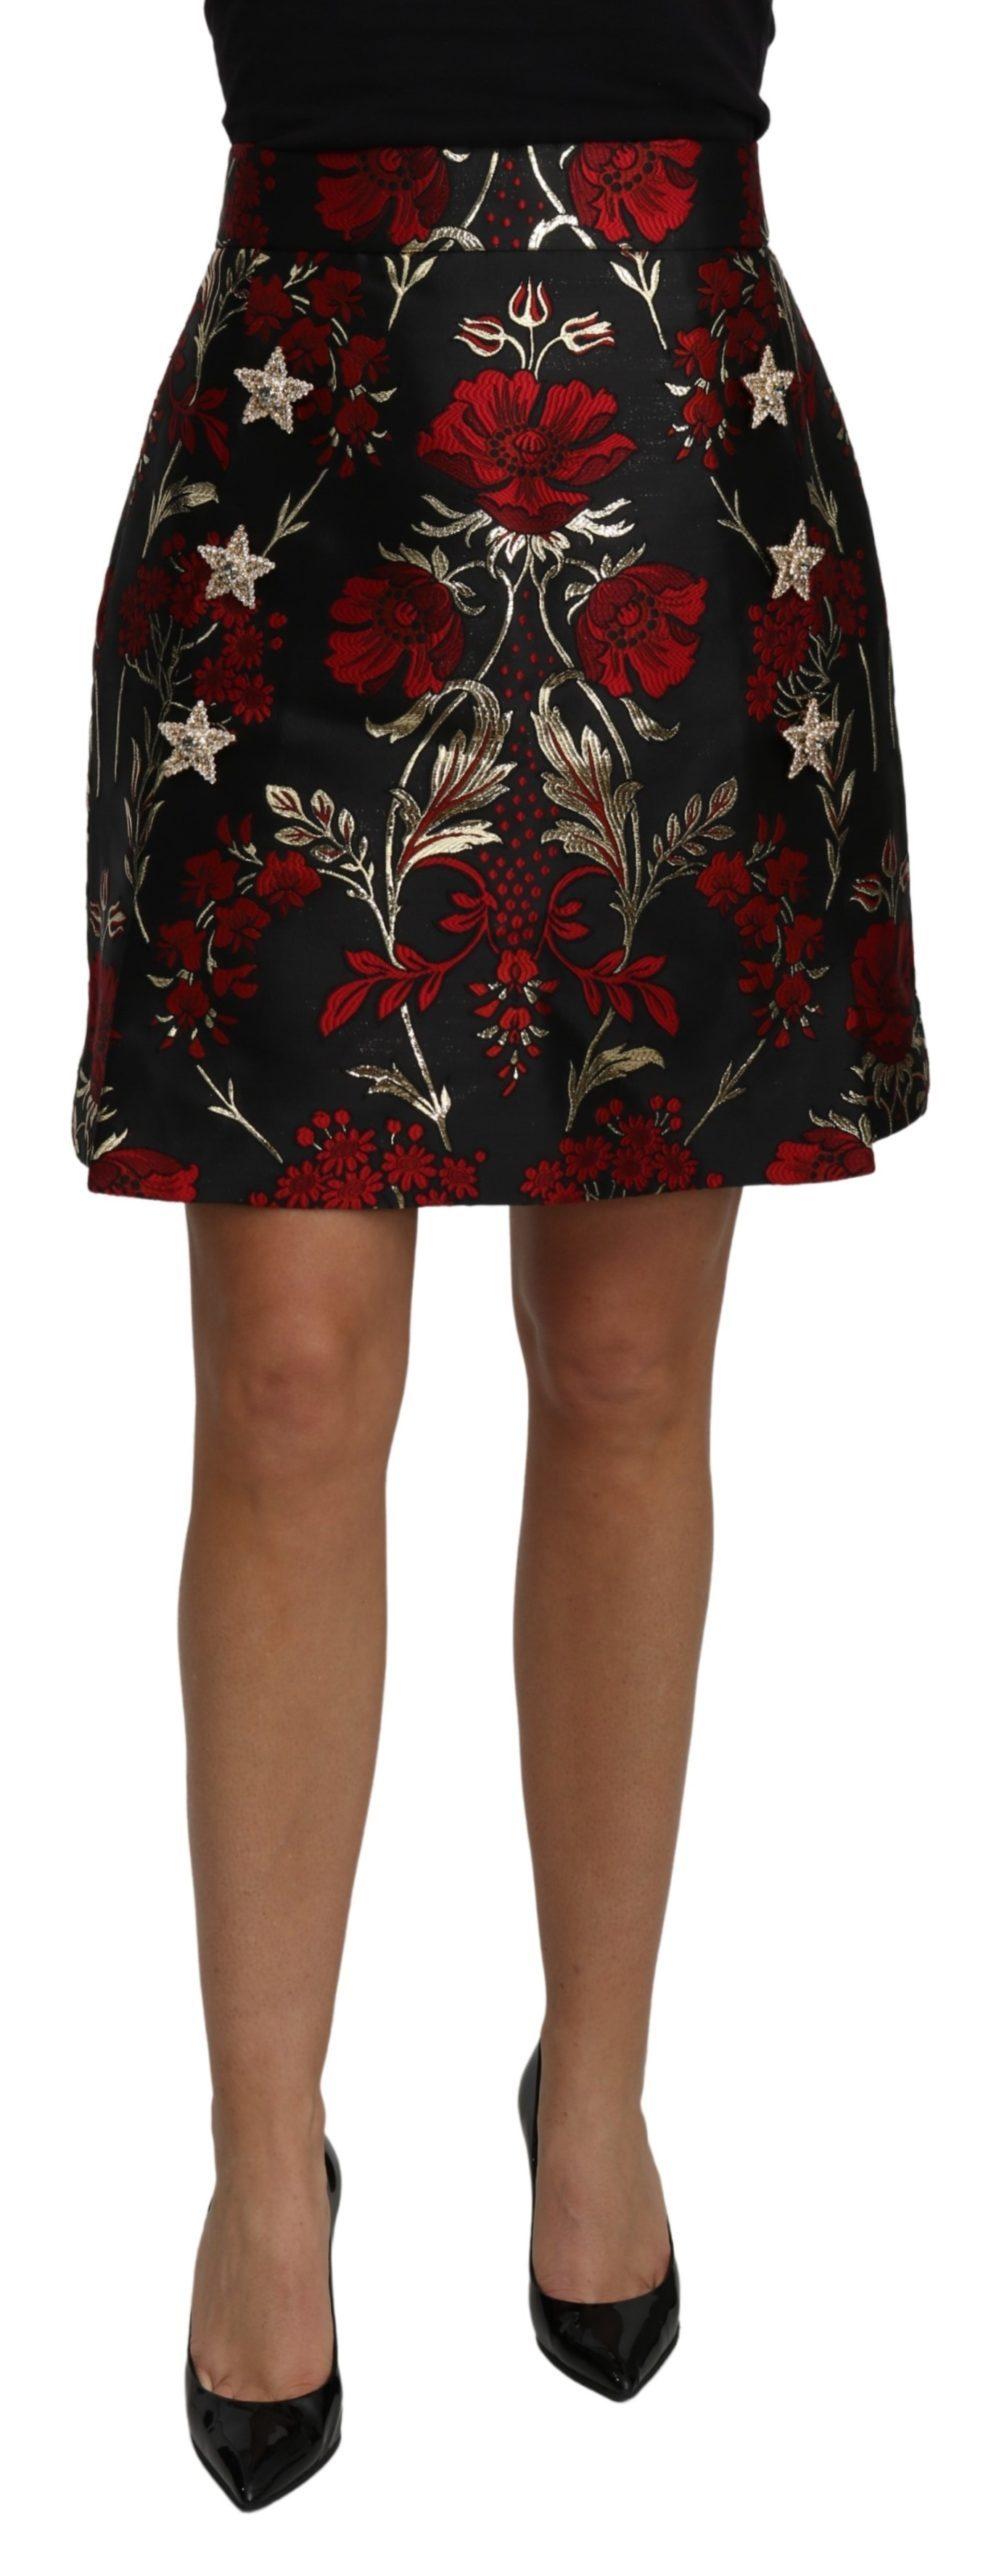 Dolce & Gabbana Women's Floral Jacquard High Waist Mini Skirt Black SKI1464 - IT44|L